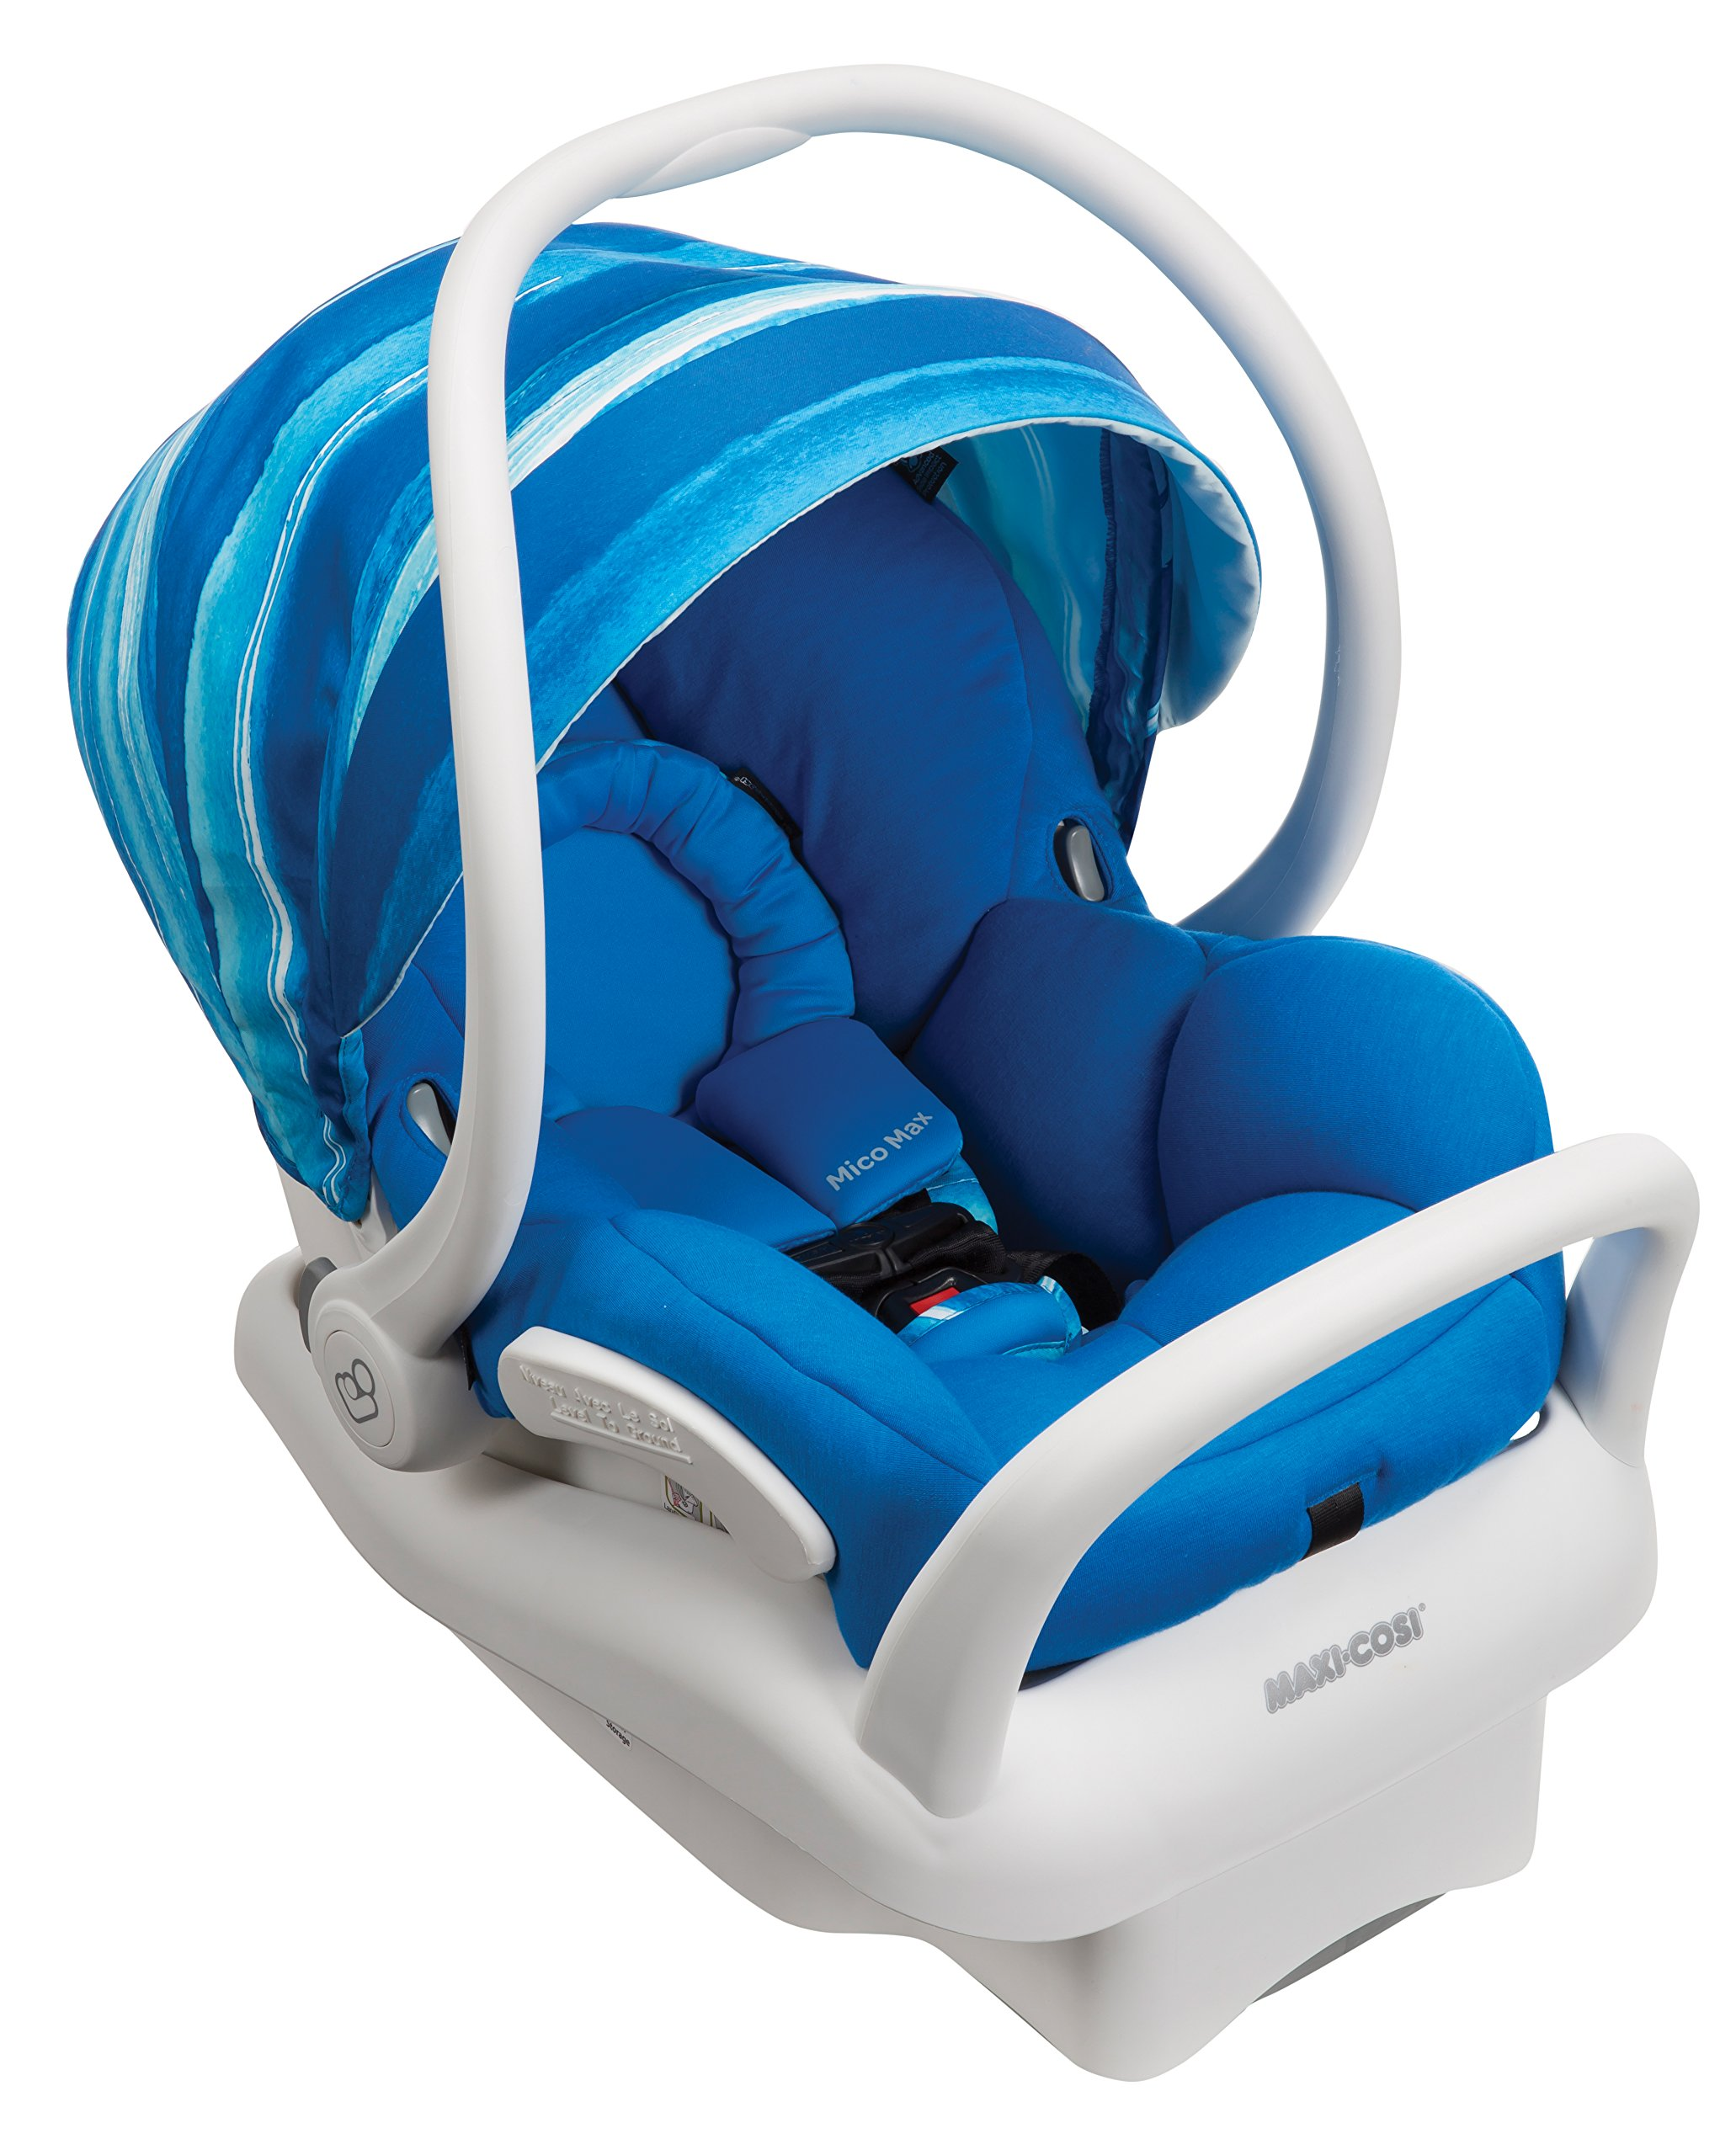 Amazon.com : Maxi-Cosi Kaia Special Edition Stroller, Water Color : Baby